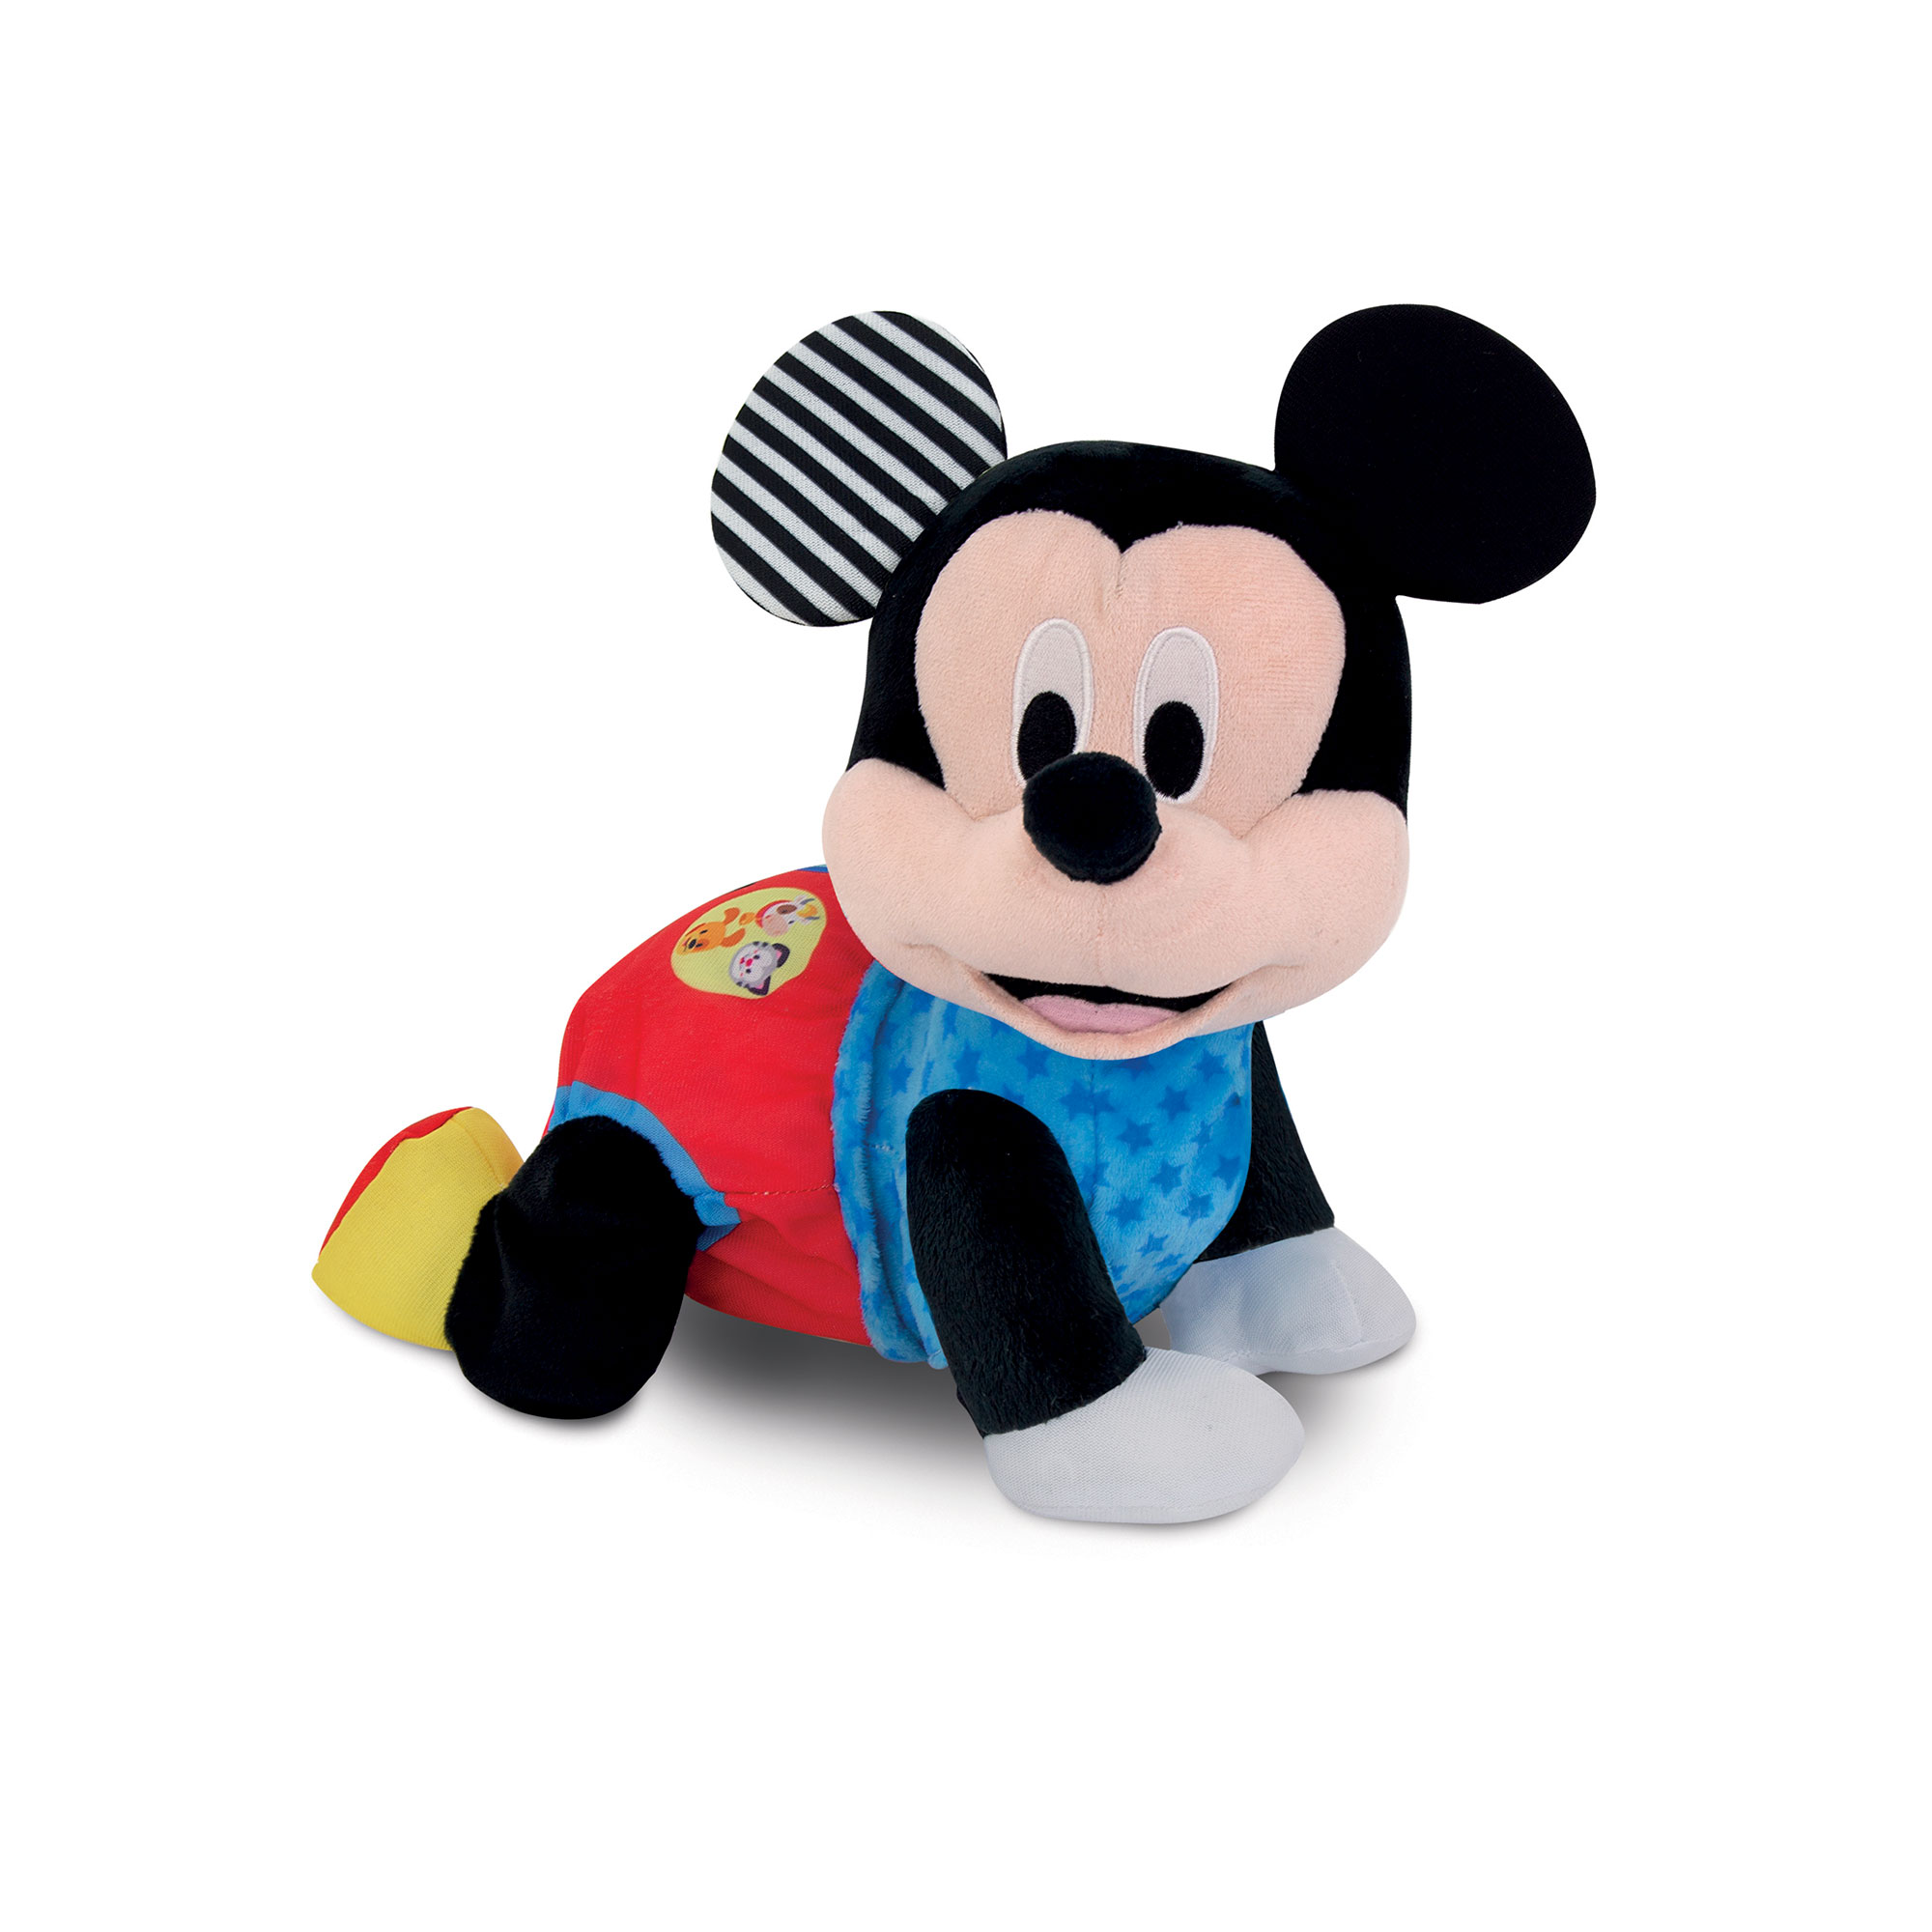 Clementoni - 17237 - baby mickey gattona con me - Disney